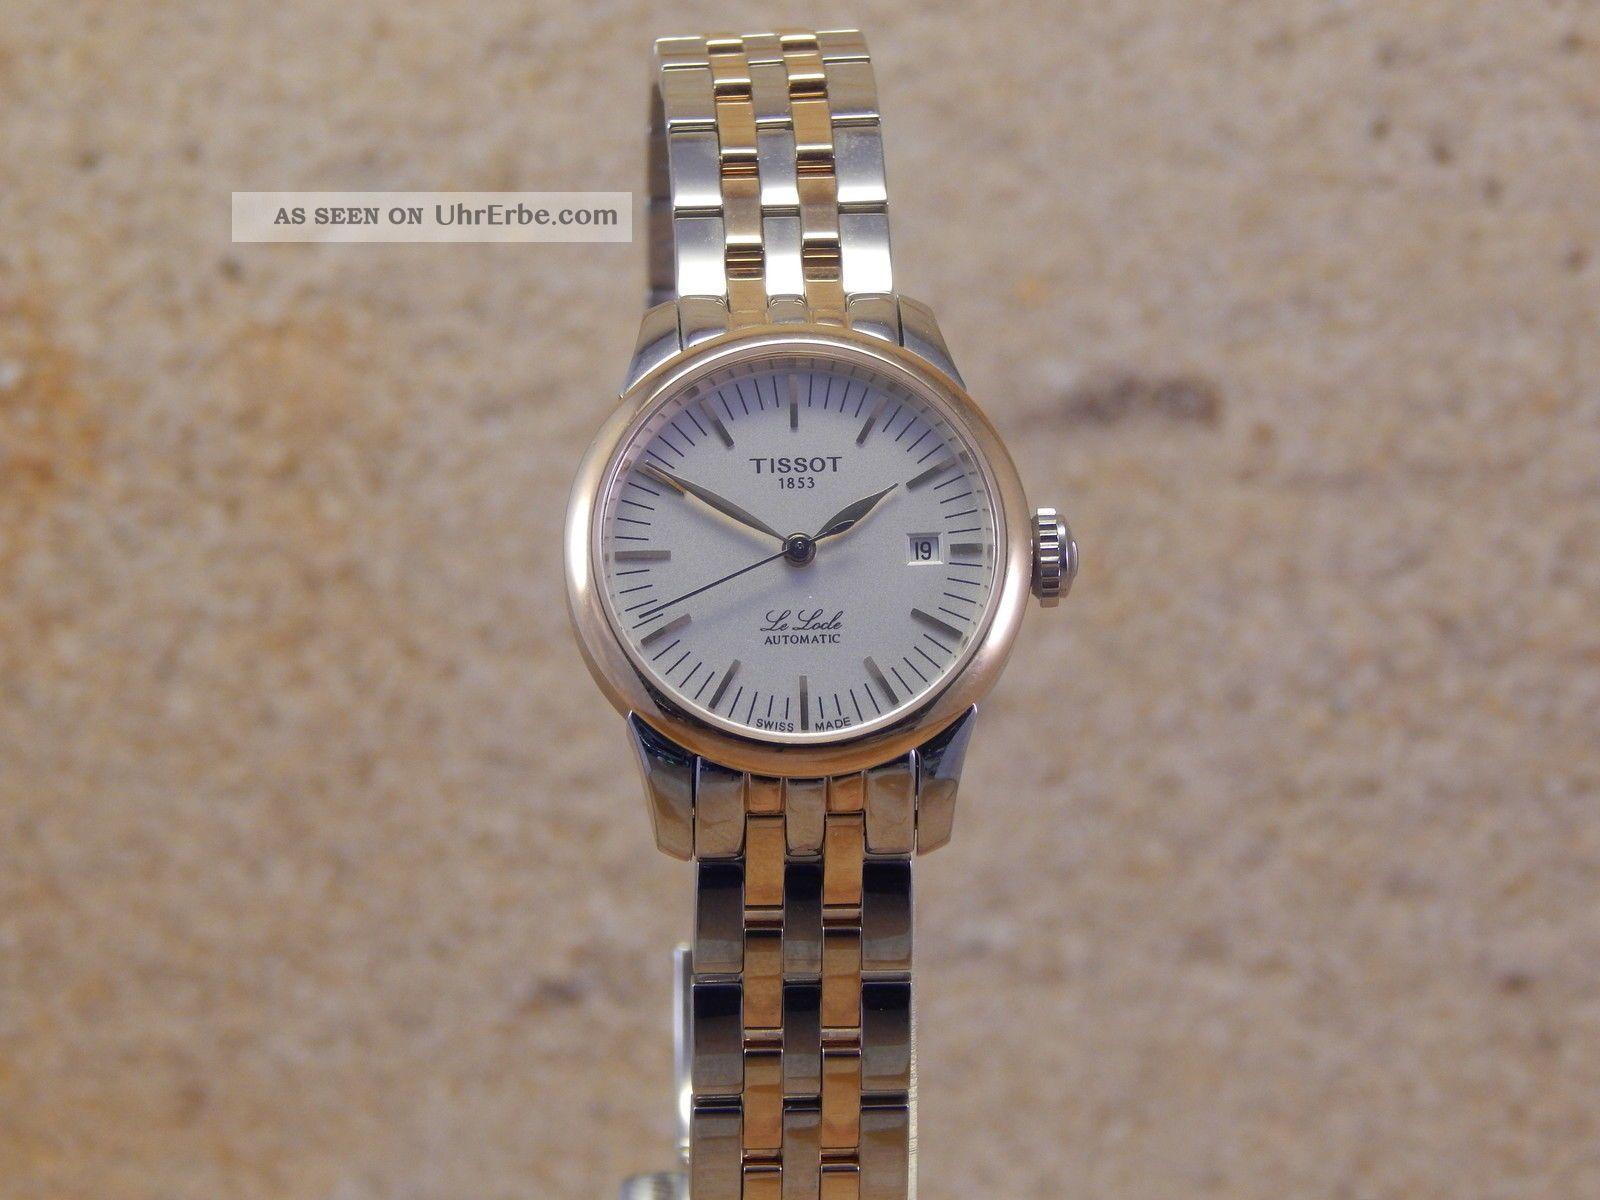 Tissot Damen - Armbanduhr Automatik T41.  2.  183.  31 W37 Armbanduhren Bild